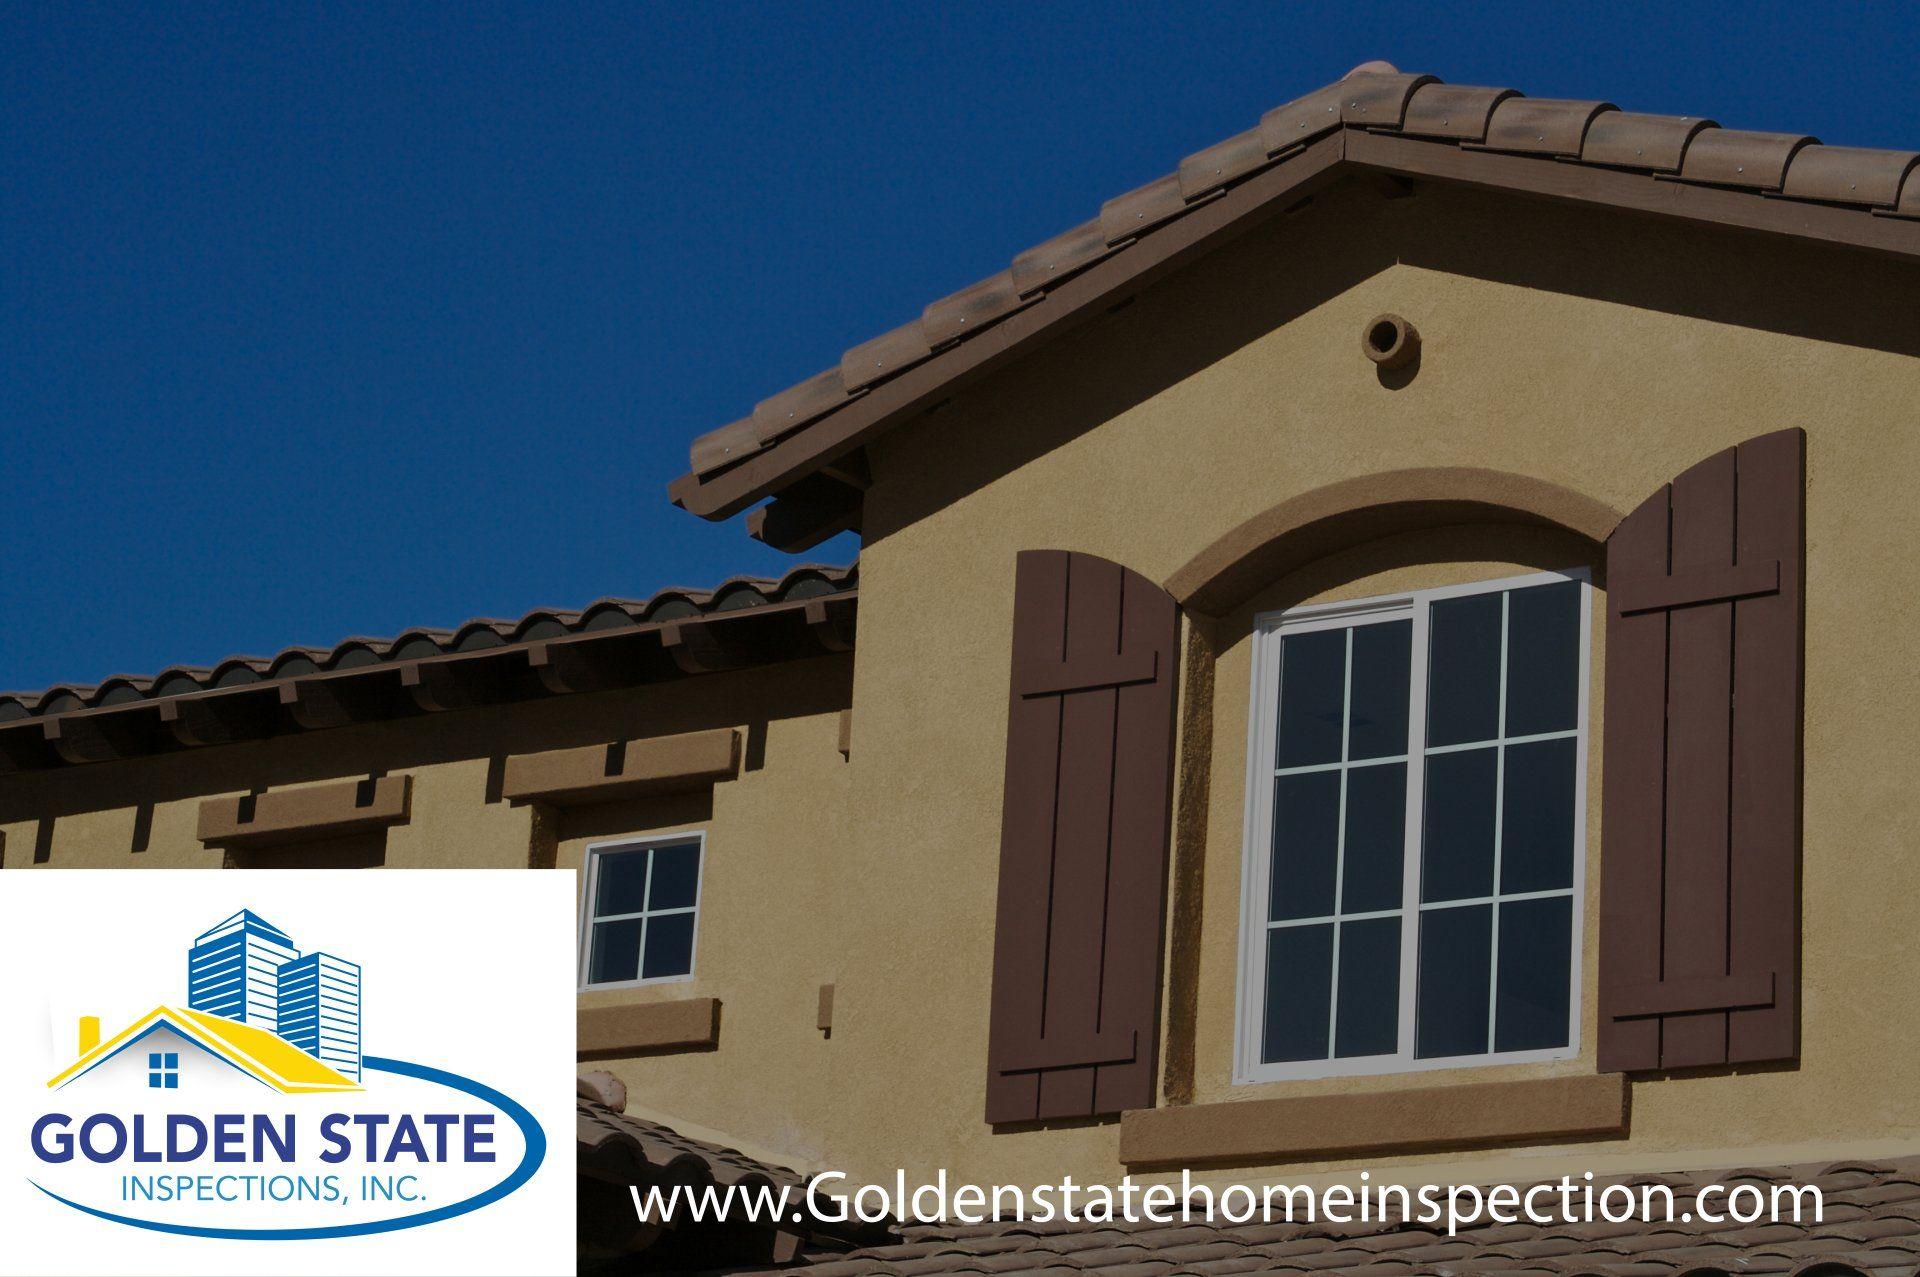 Home Inspections Sacramento Commercial Building Inspector Mold Pest